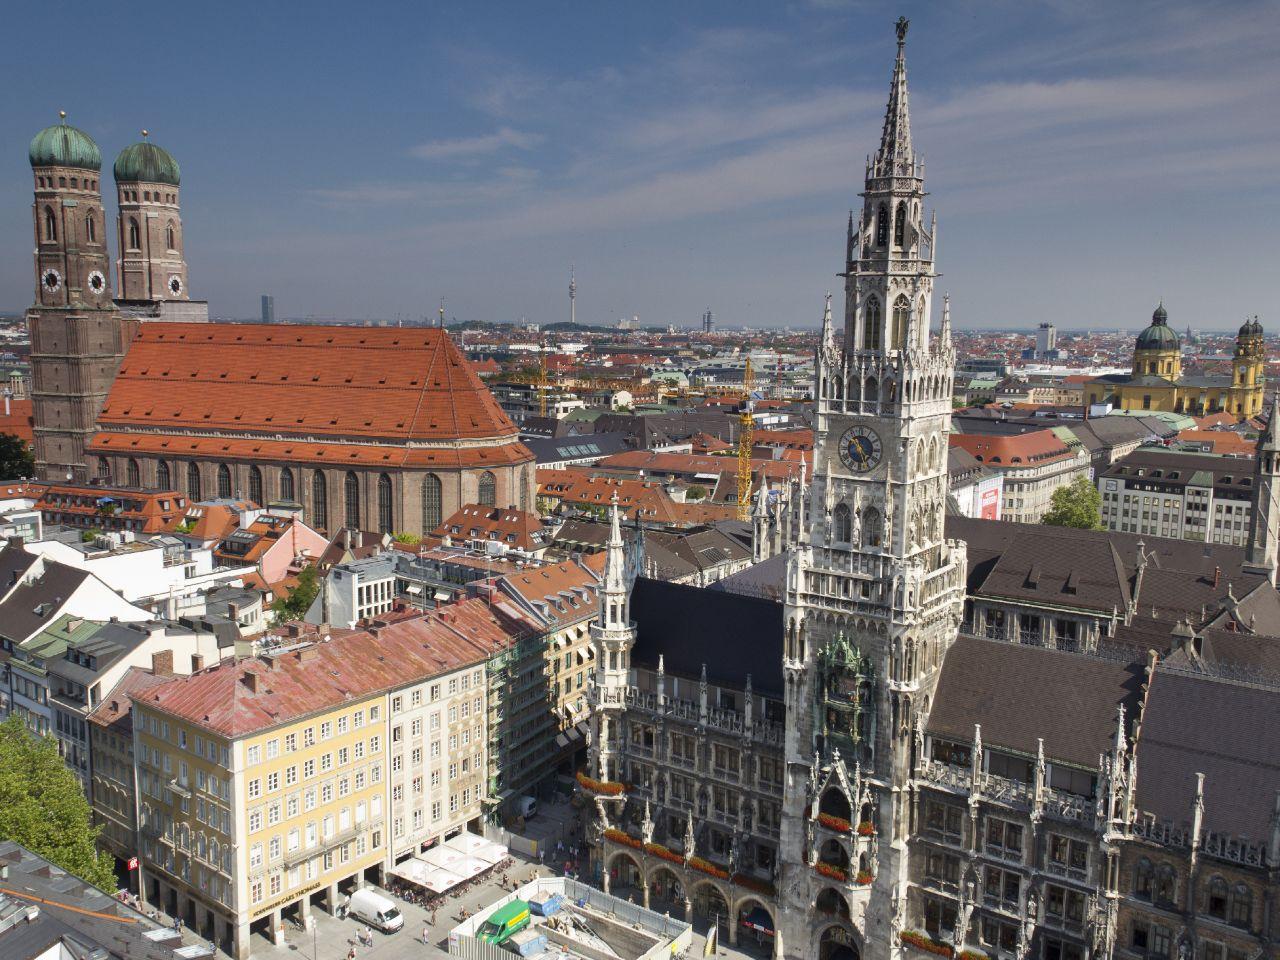 Kirche Alter Peter In München Das Offizielle Stadtportal Muenchende